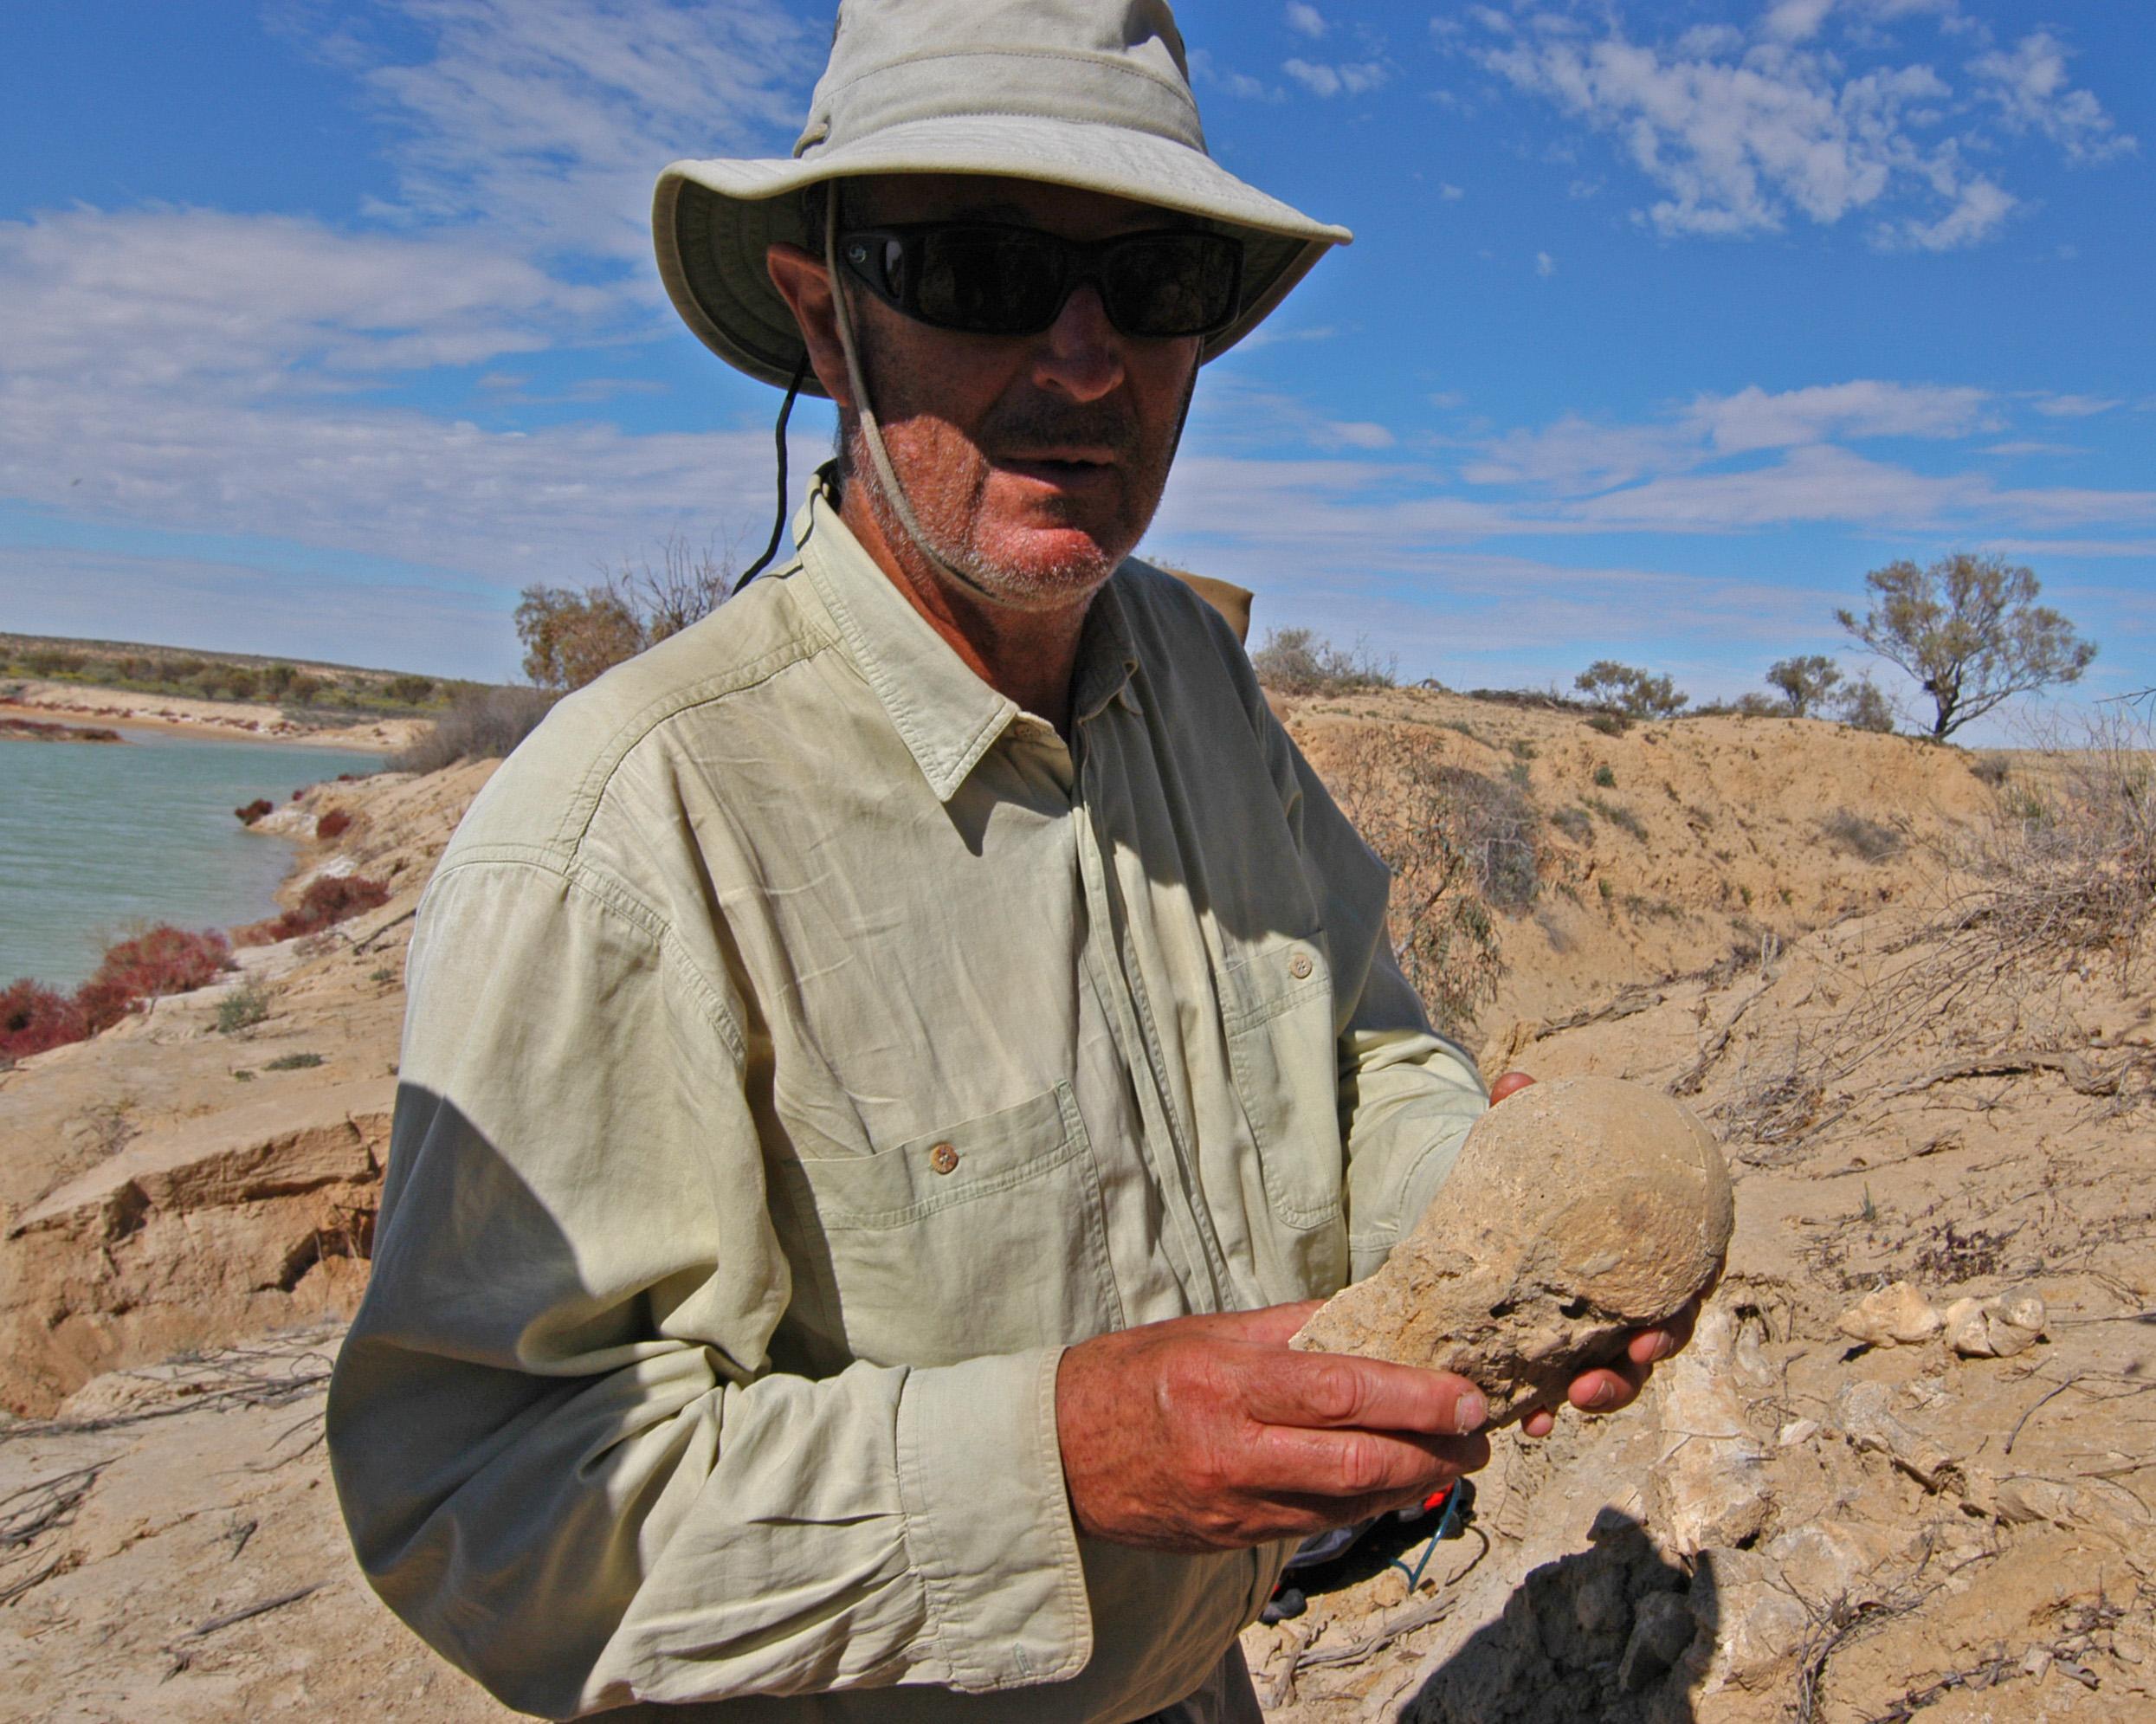 The expedition doctor examines a fossilised megafauna bone.